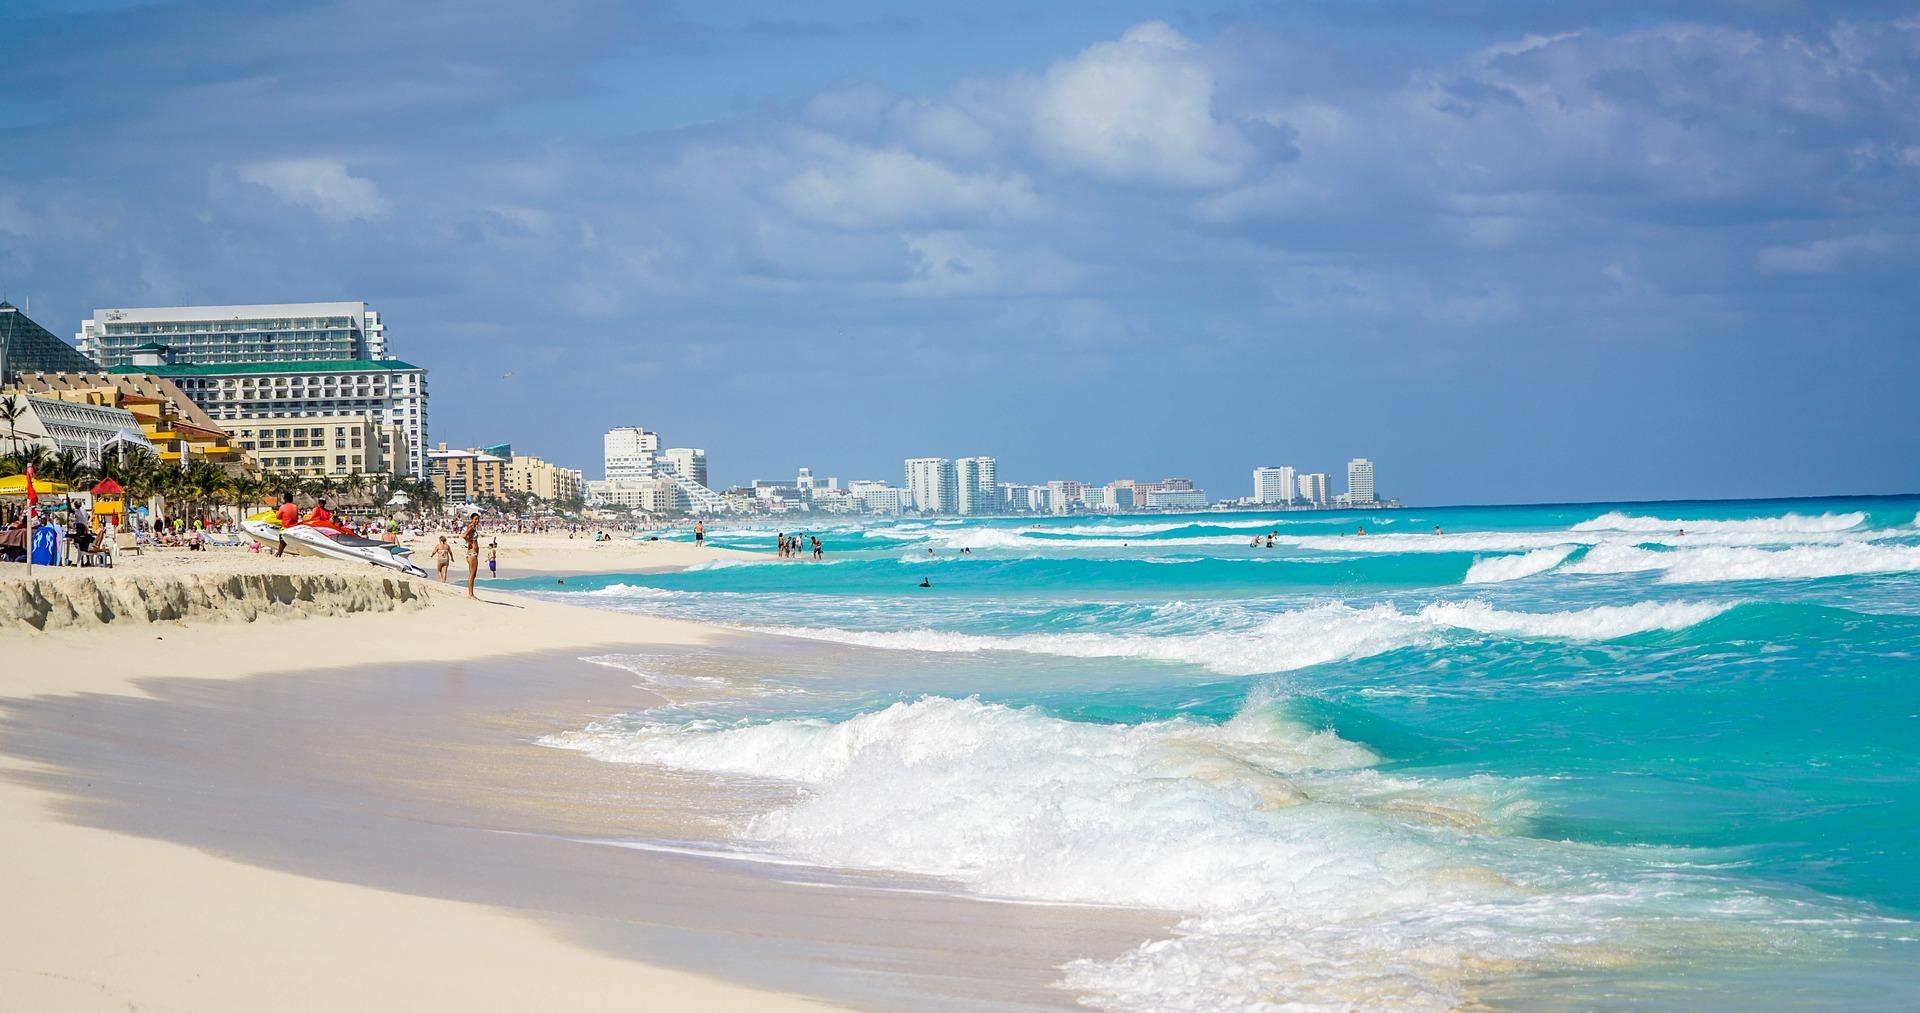 Mexiko Urlaub 3 Wochen All Inclusive günstig ab 1475,00€ - Cancun Yucatan